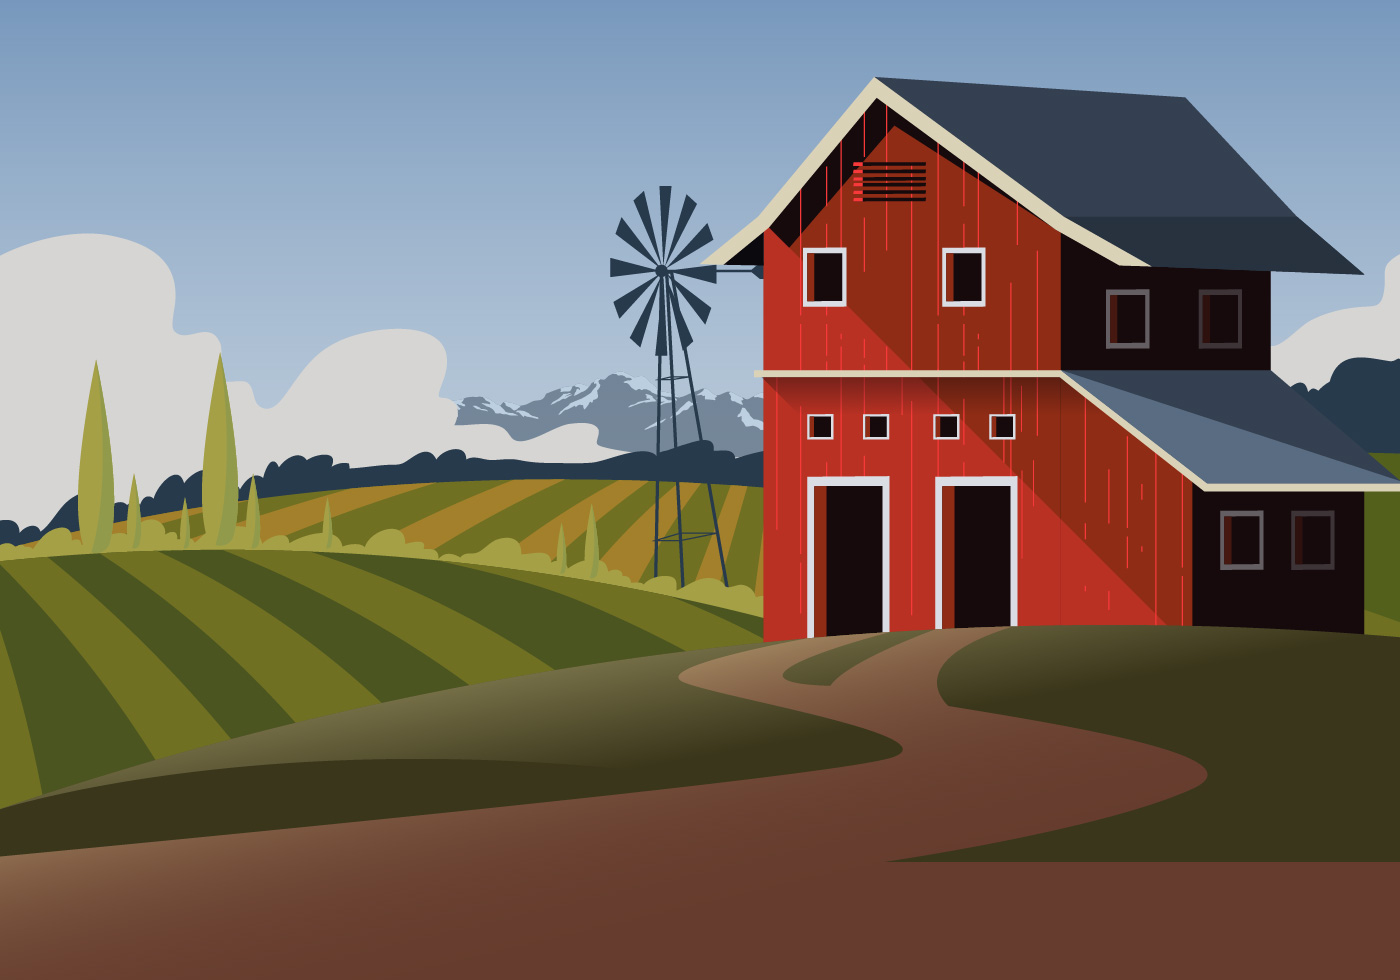 Red Barn Vector Scene - Download Free Vectors, Clipart ...